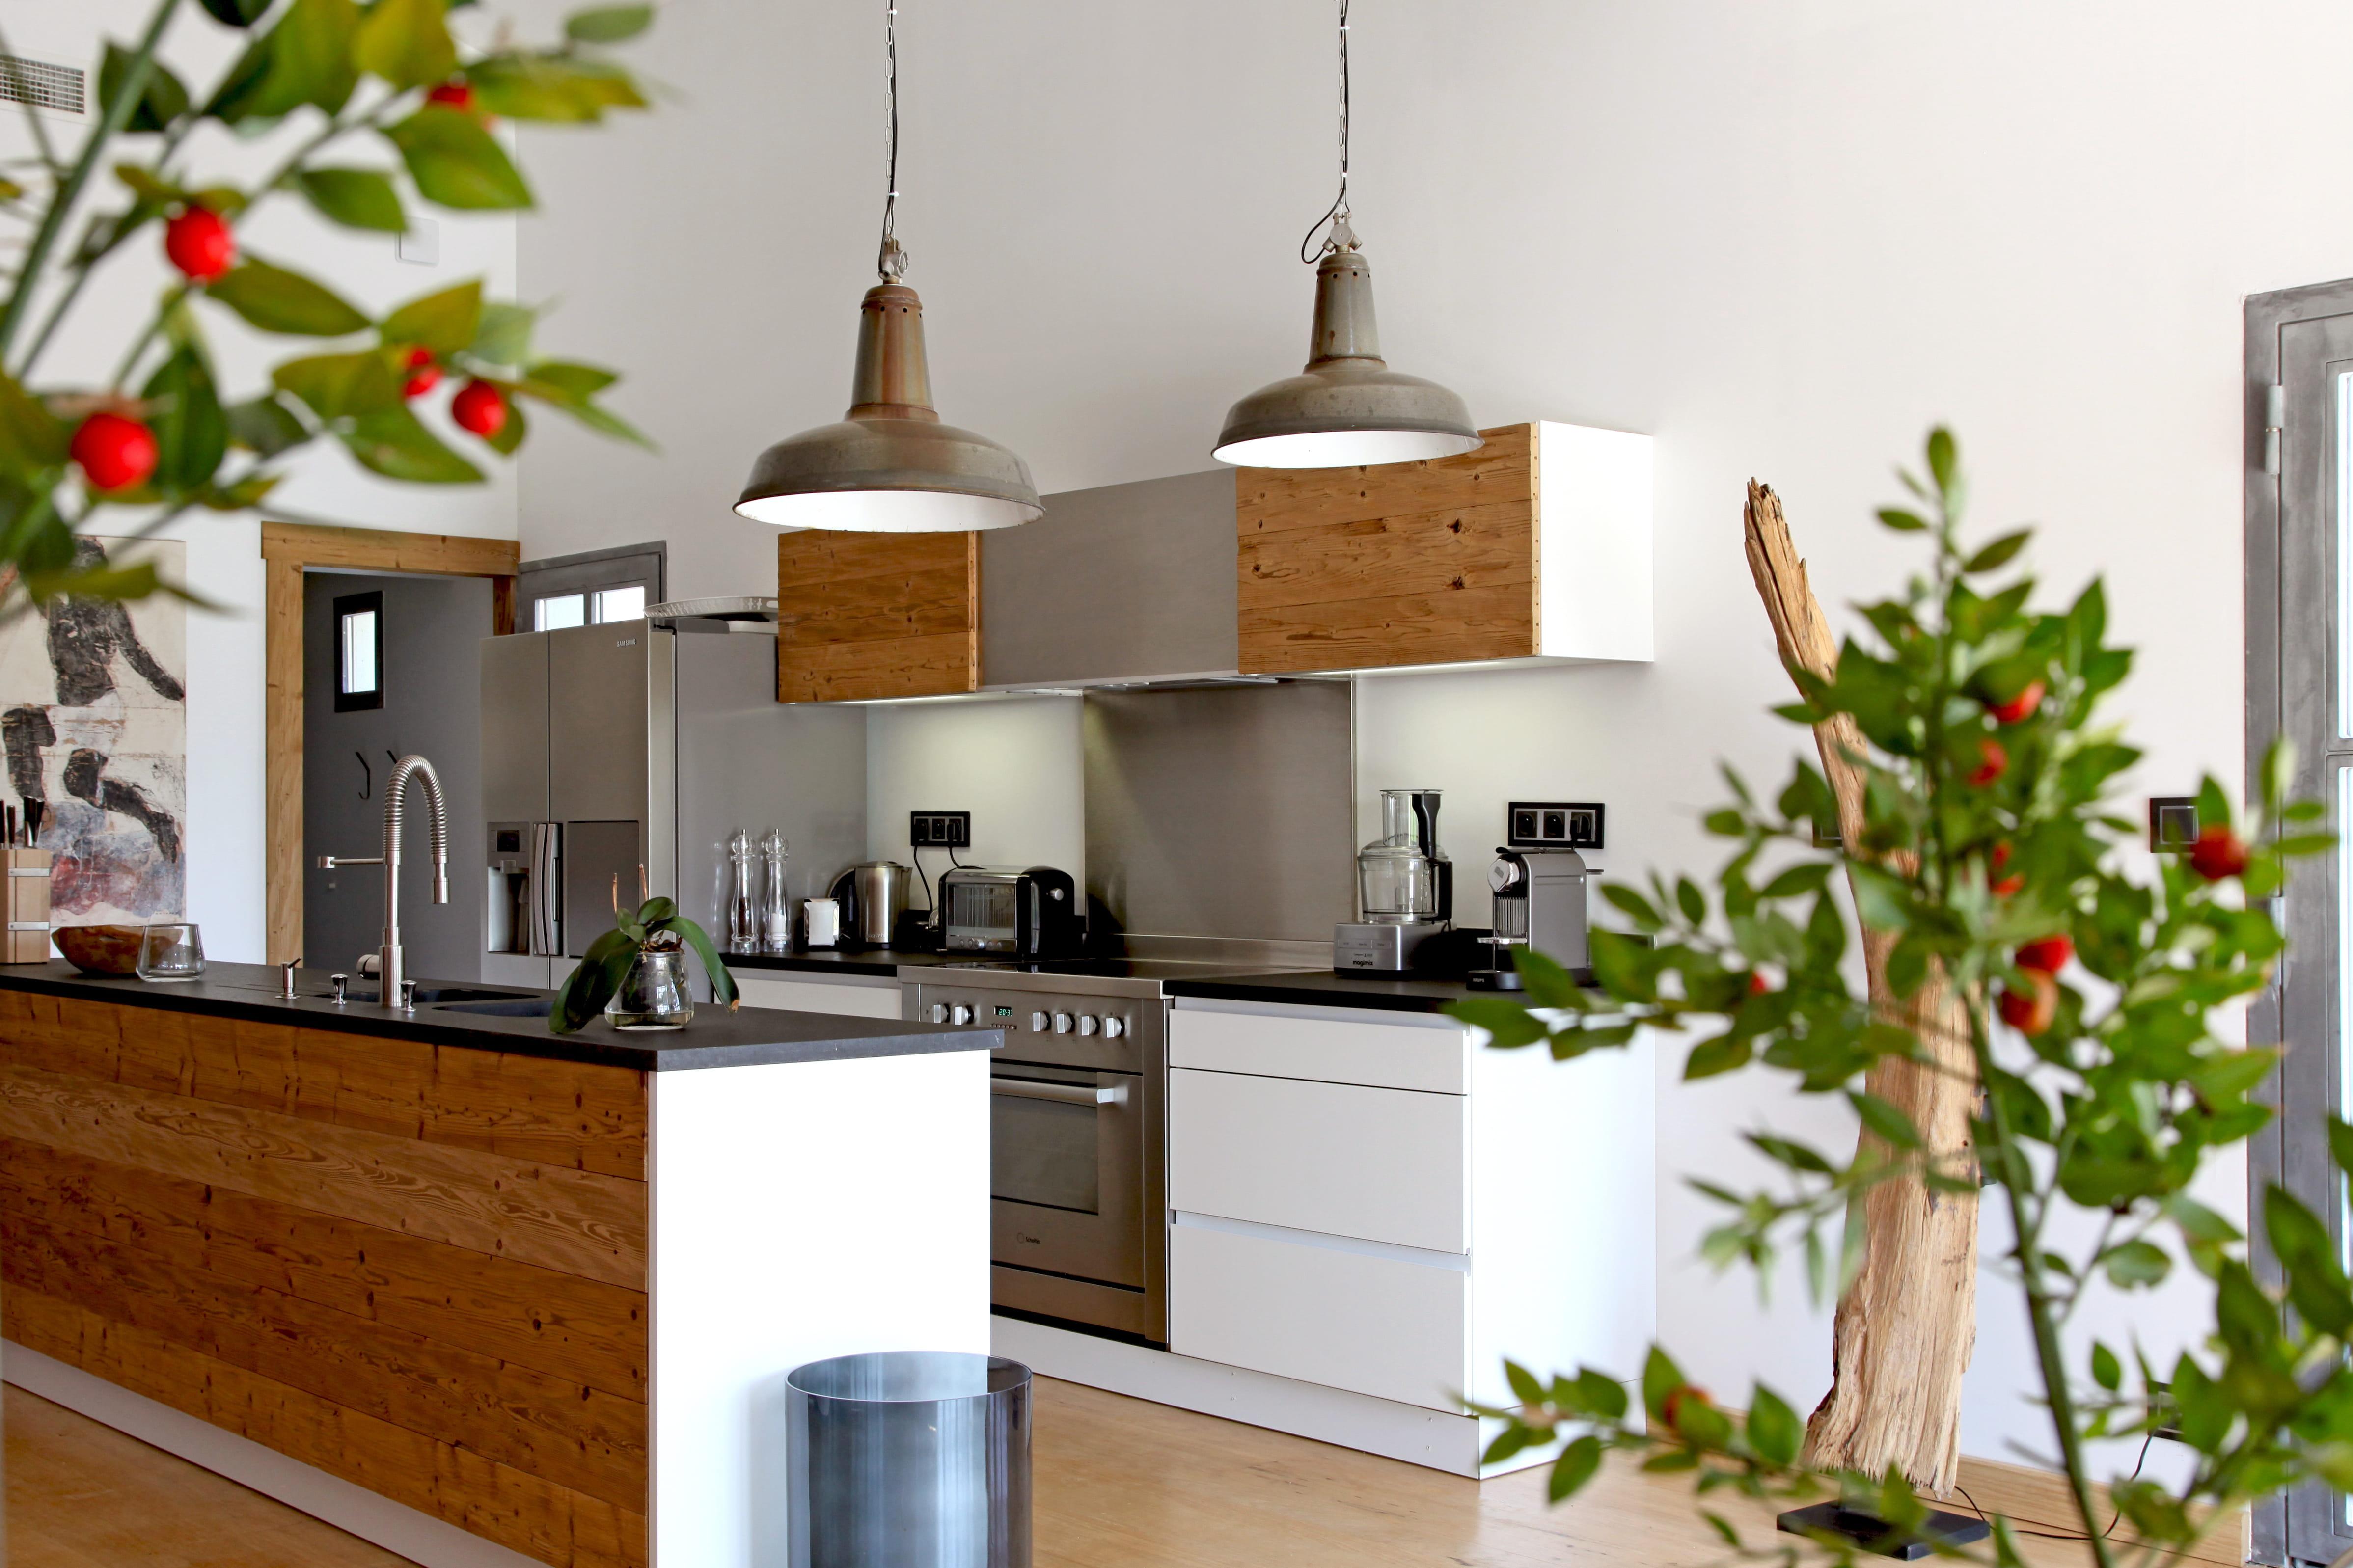 Relooker une cuisine rustique pictures to pin on pinterest - Relooker une cuisine ancienne ...